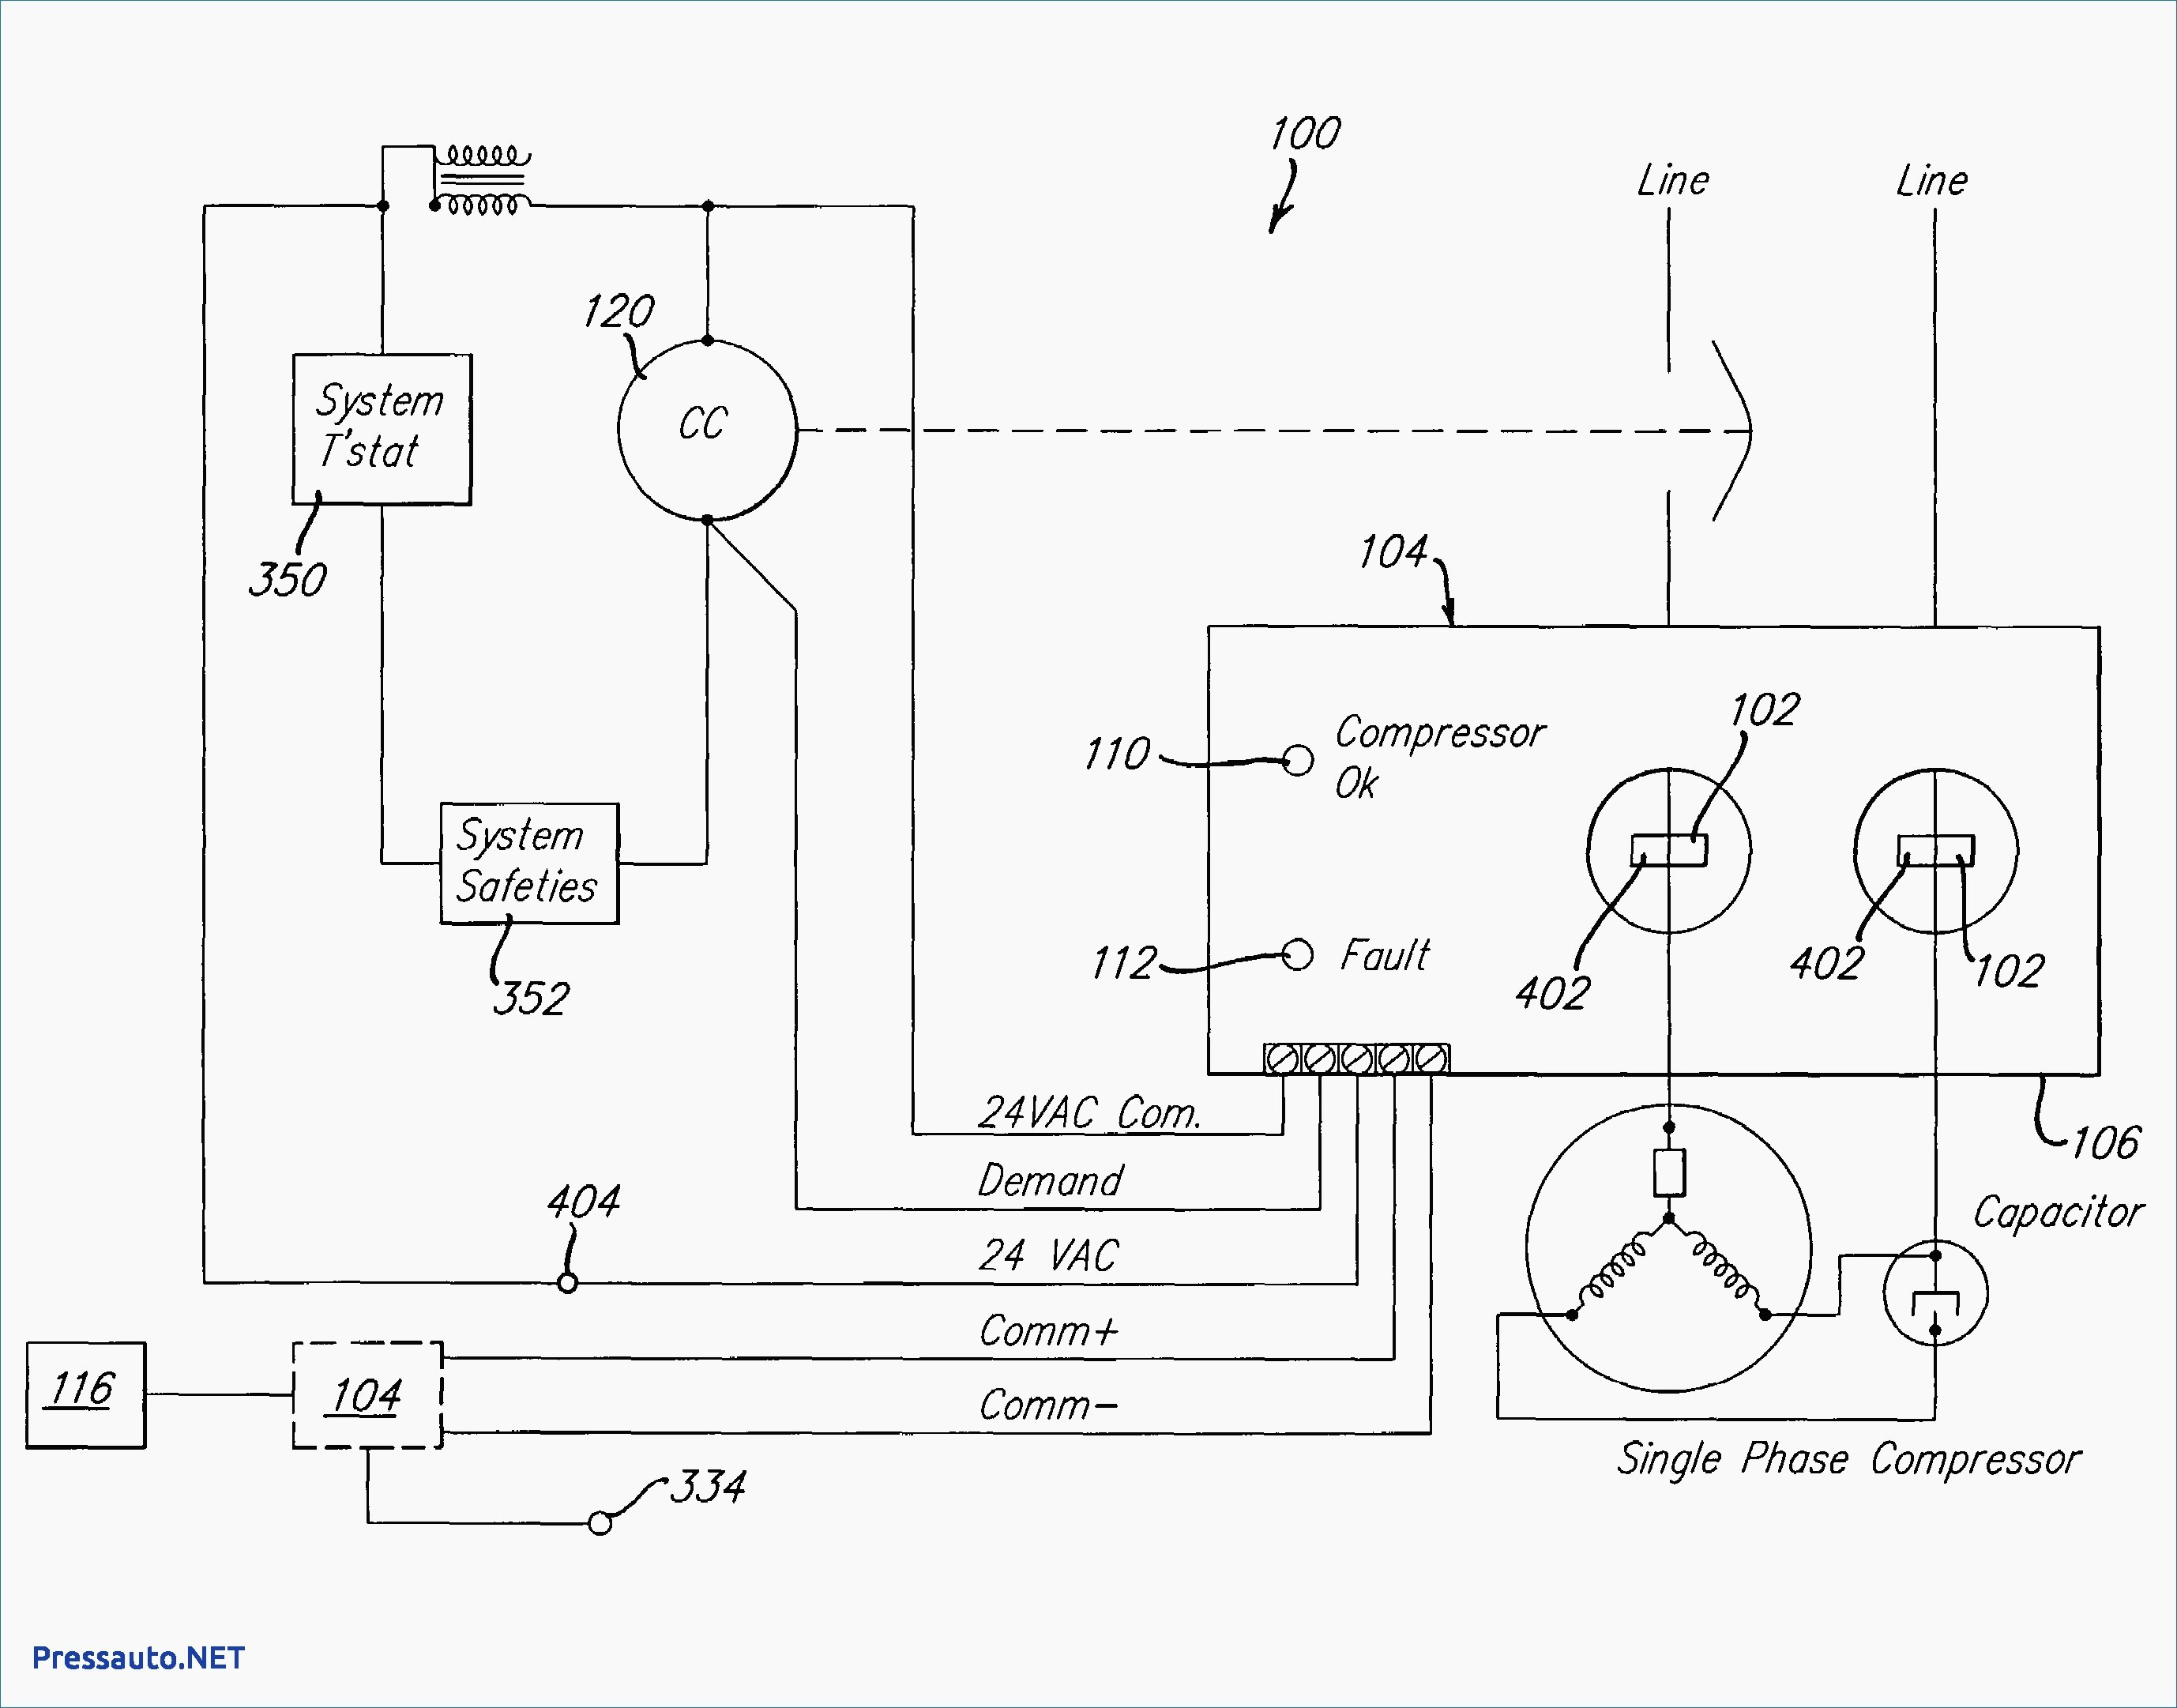 Ge Blower Motor Wiring Diagram - Delco Remy Cs Alternator Wiring Diagram -  gsxr750.losdol2-blong.jeanjaures37.fr   Ge Furnace Blower Wiring Schematic      Wiring Diagram Resource